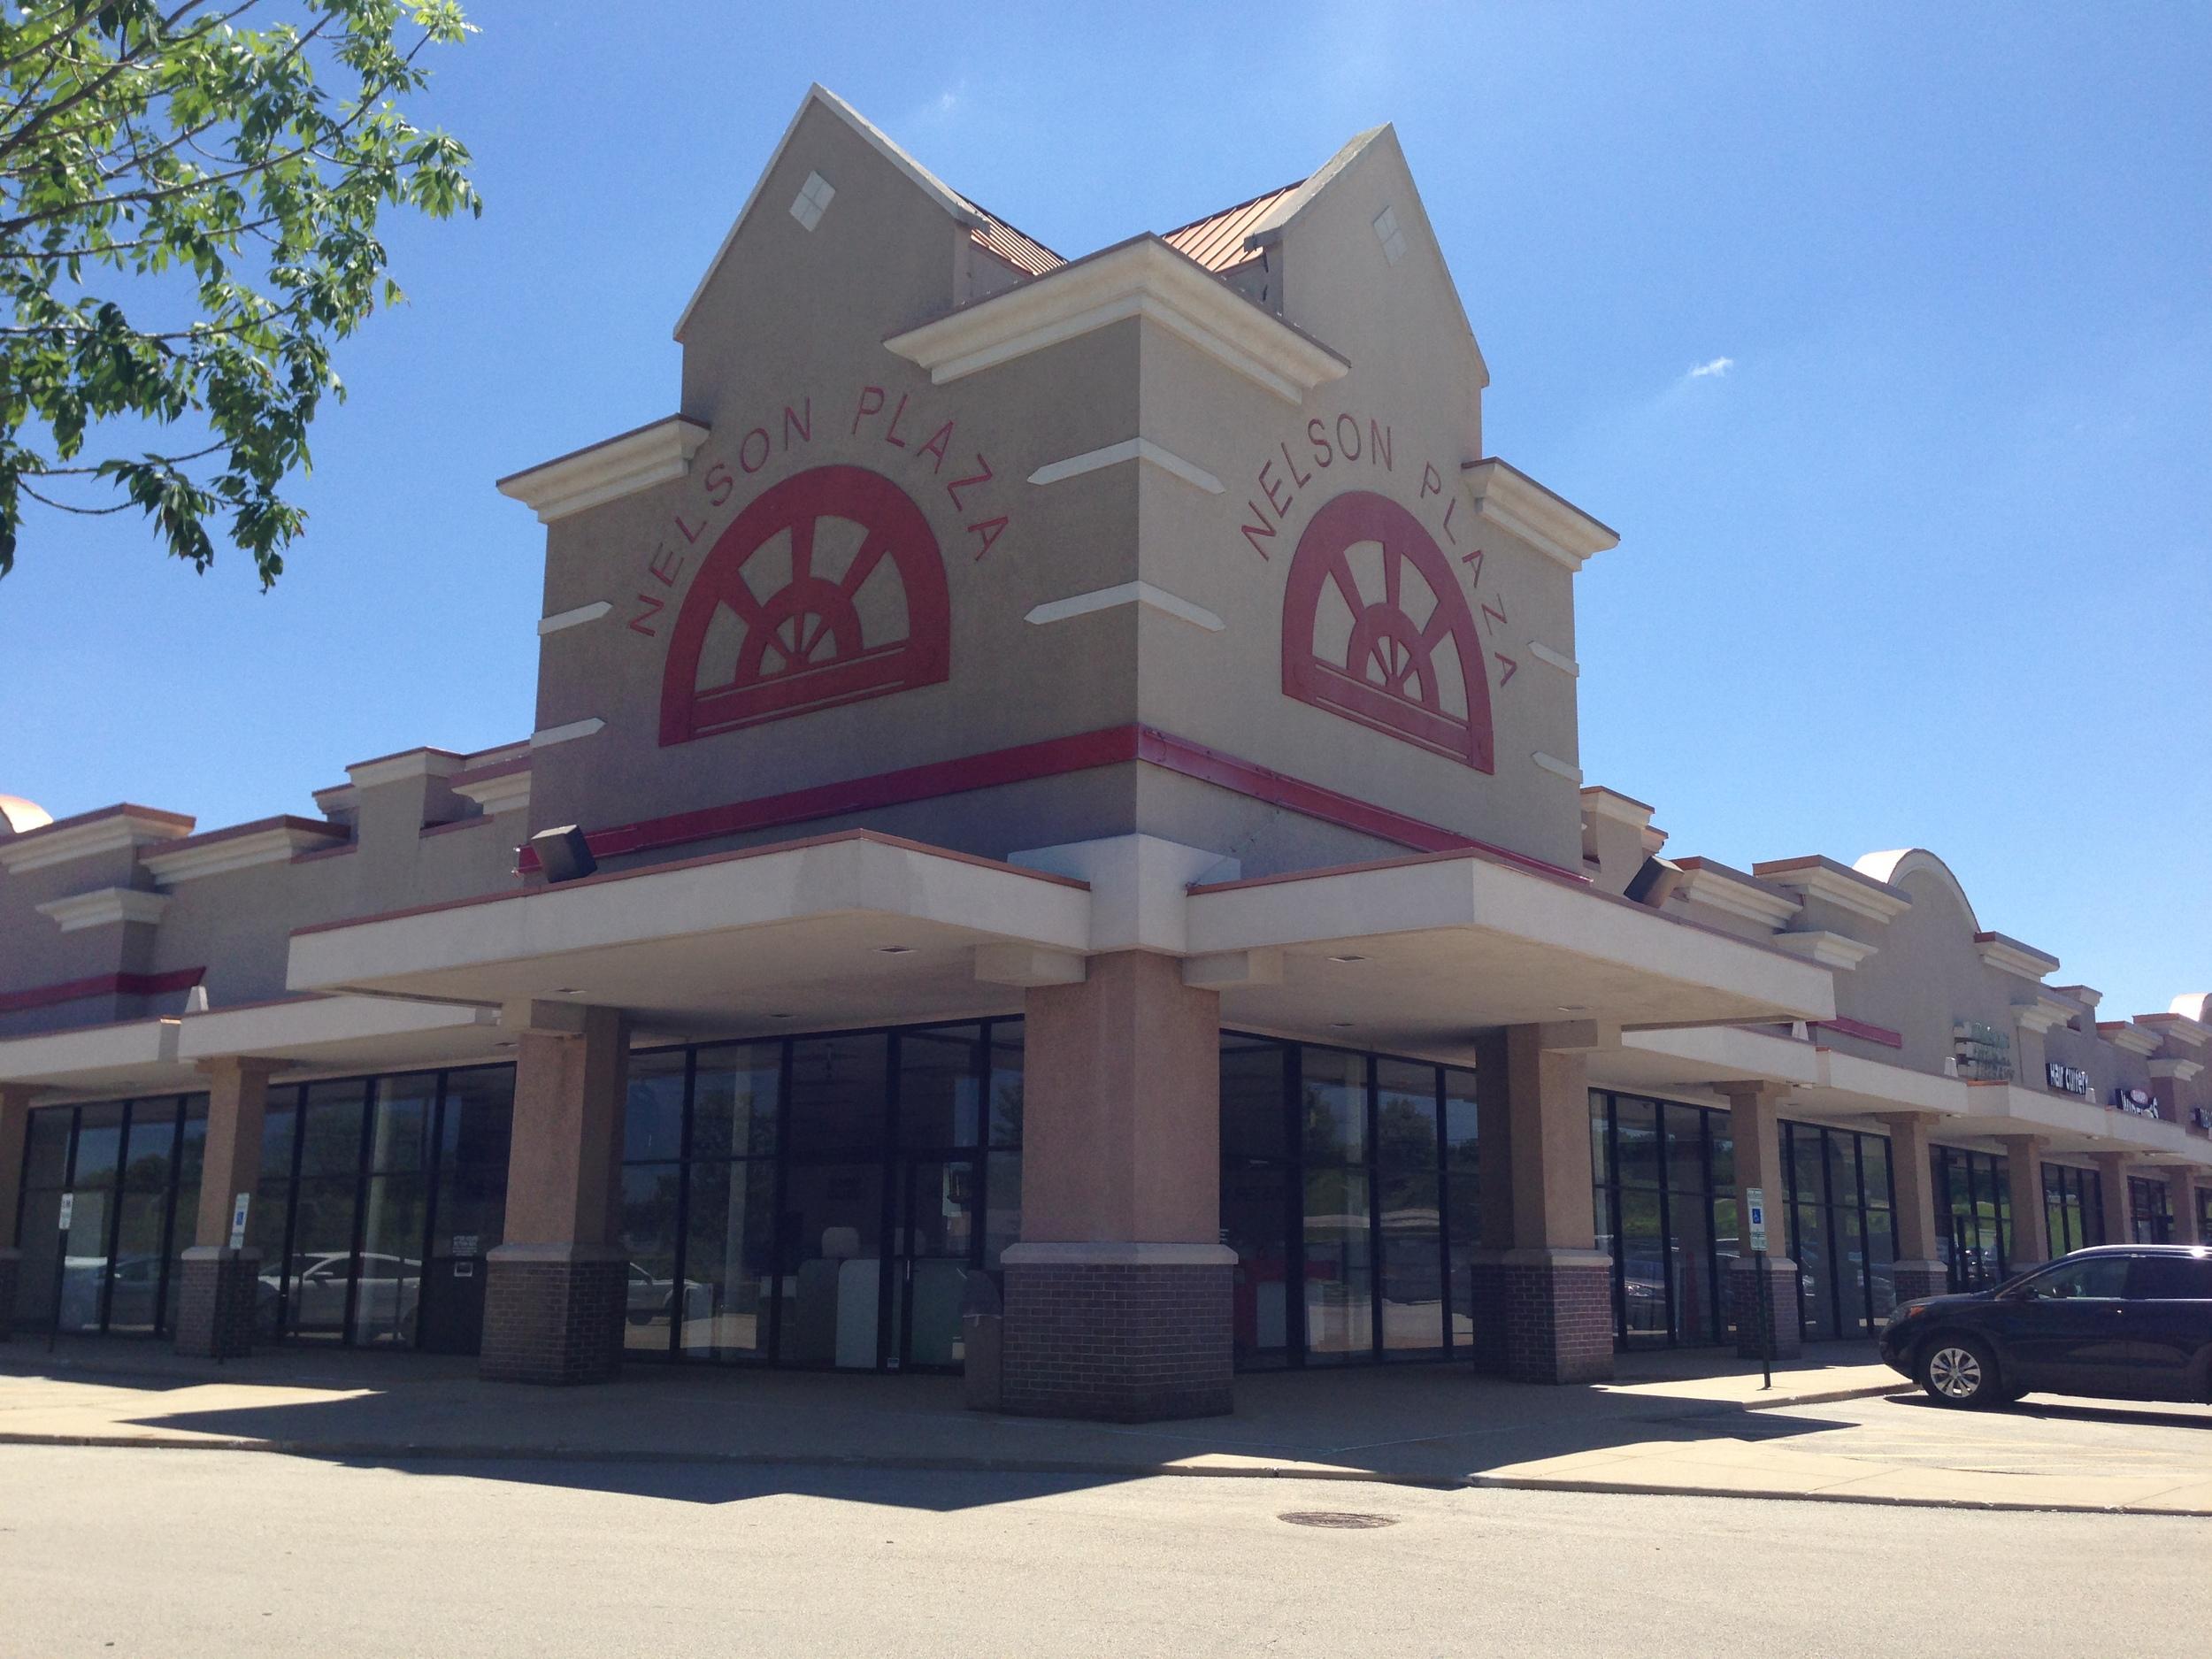 Nelson Plaza - New Lenox